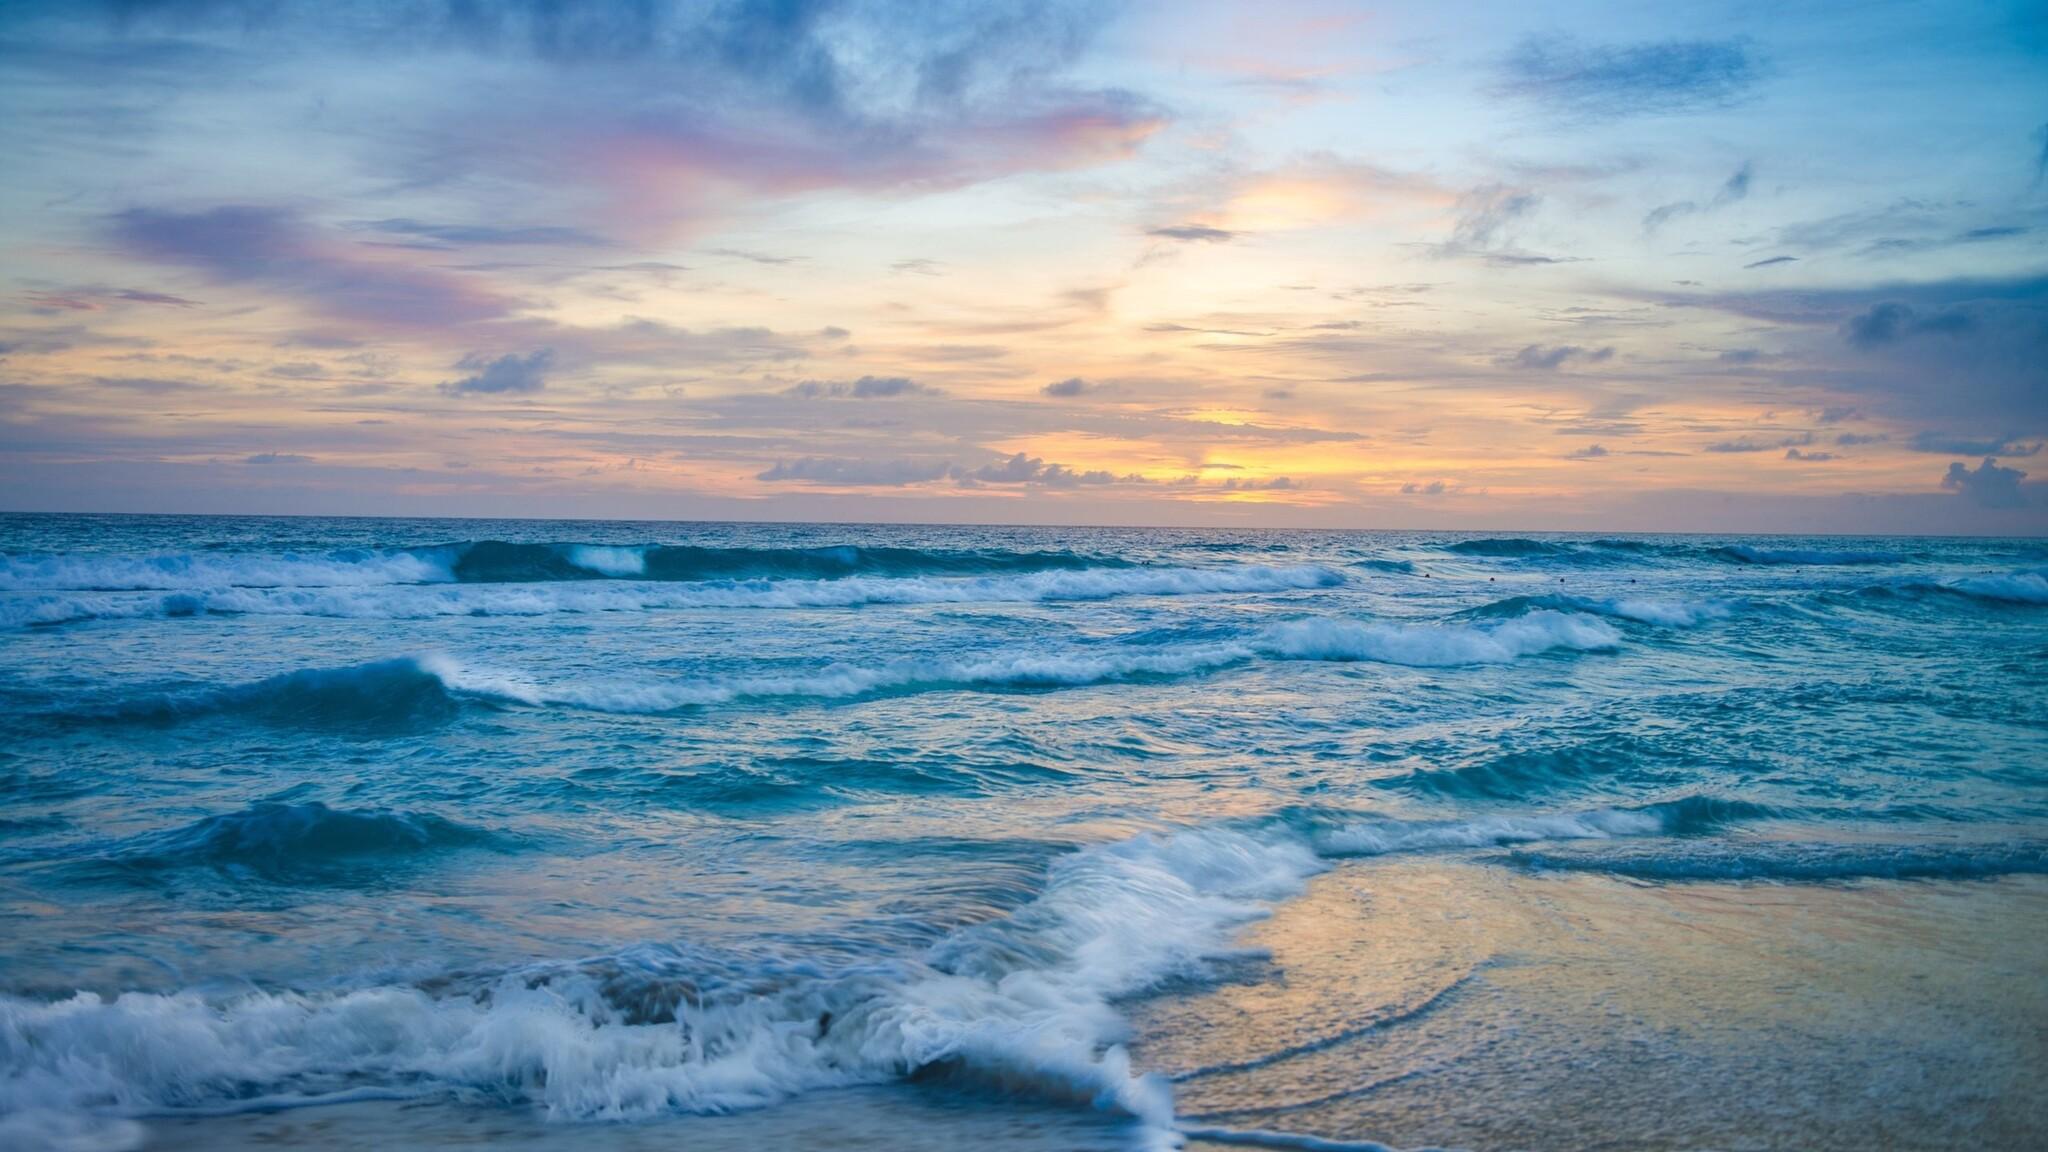 2048x1152 ocean waves at sunset 2048x1152 resolution hd 4k